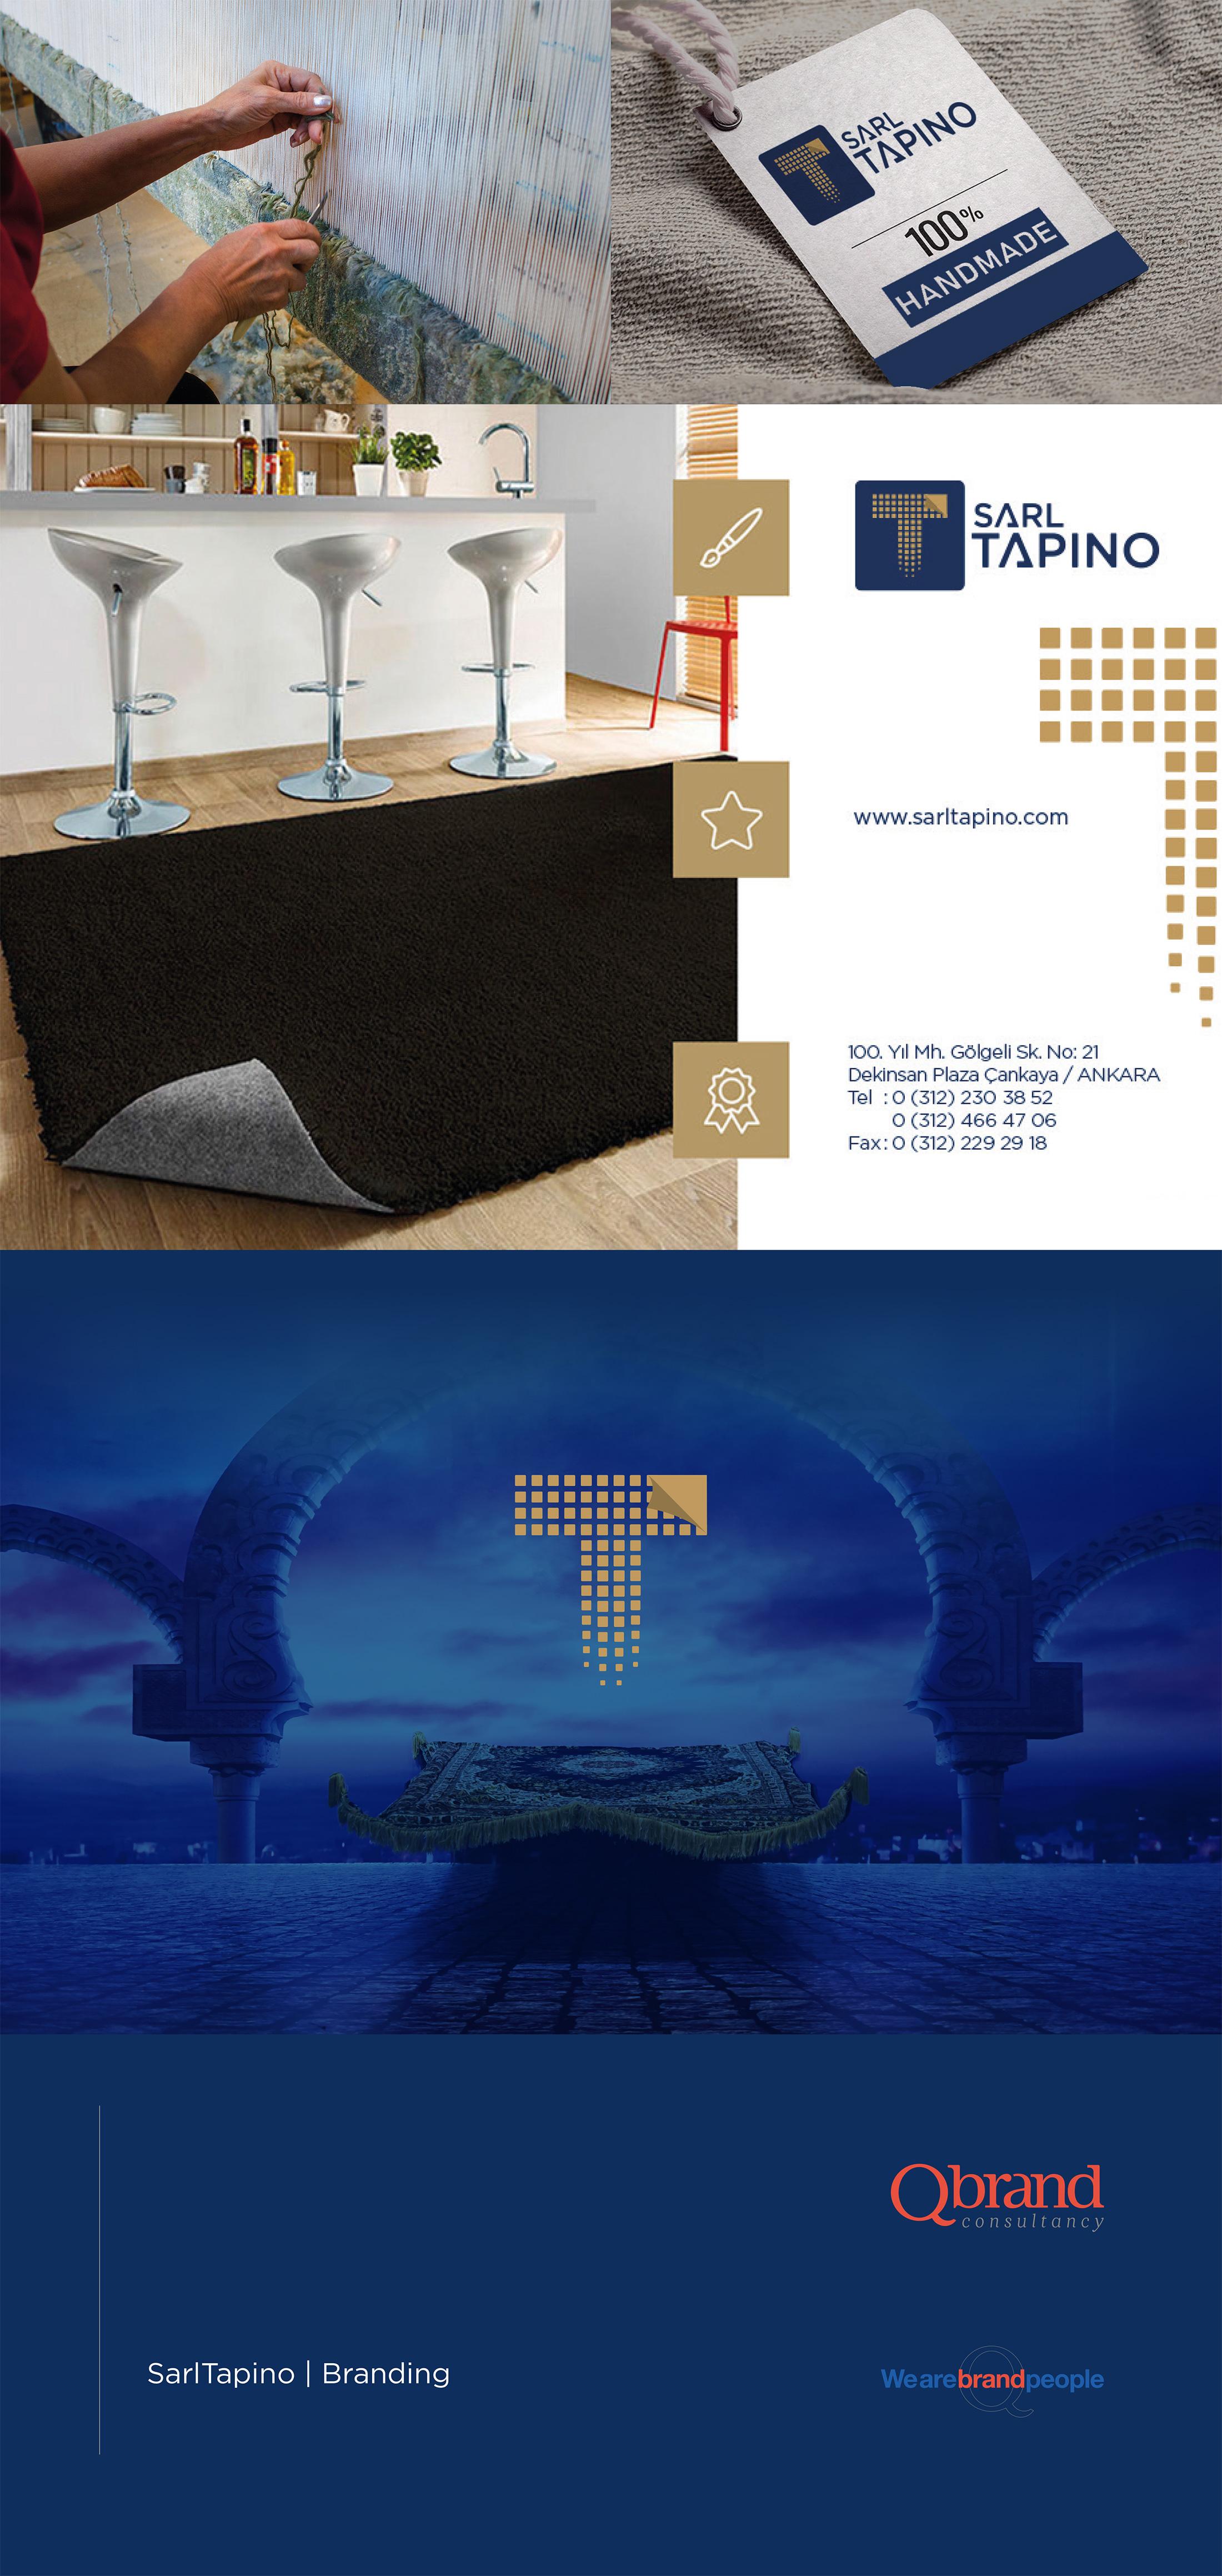 Ankara kurumsal kimlik tasarımı  Sarl Tapino